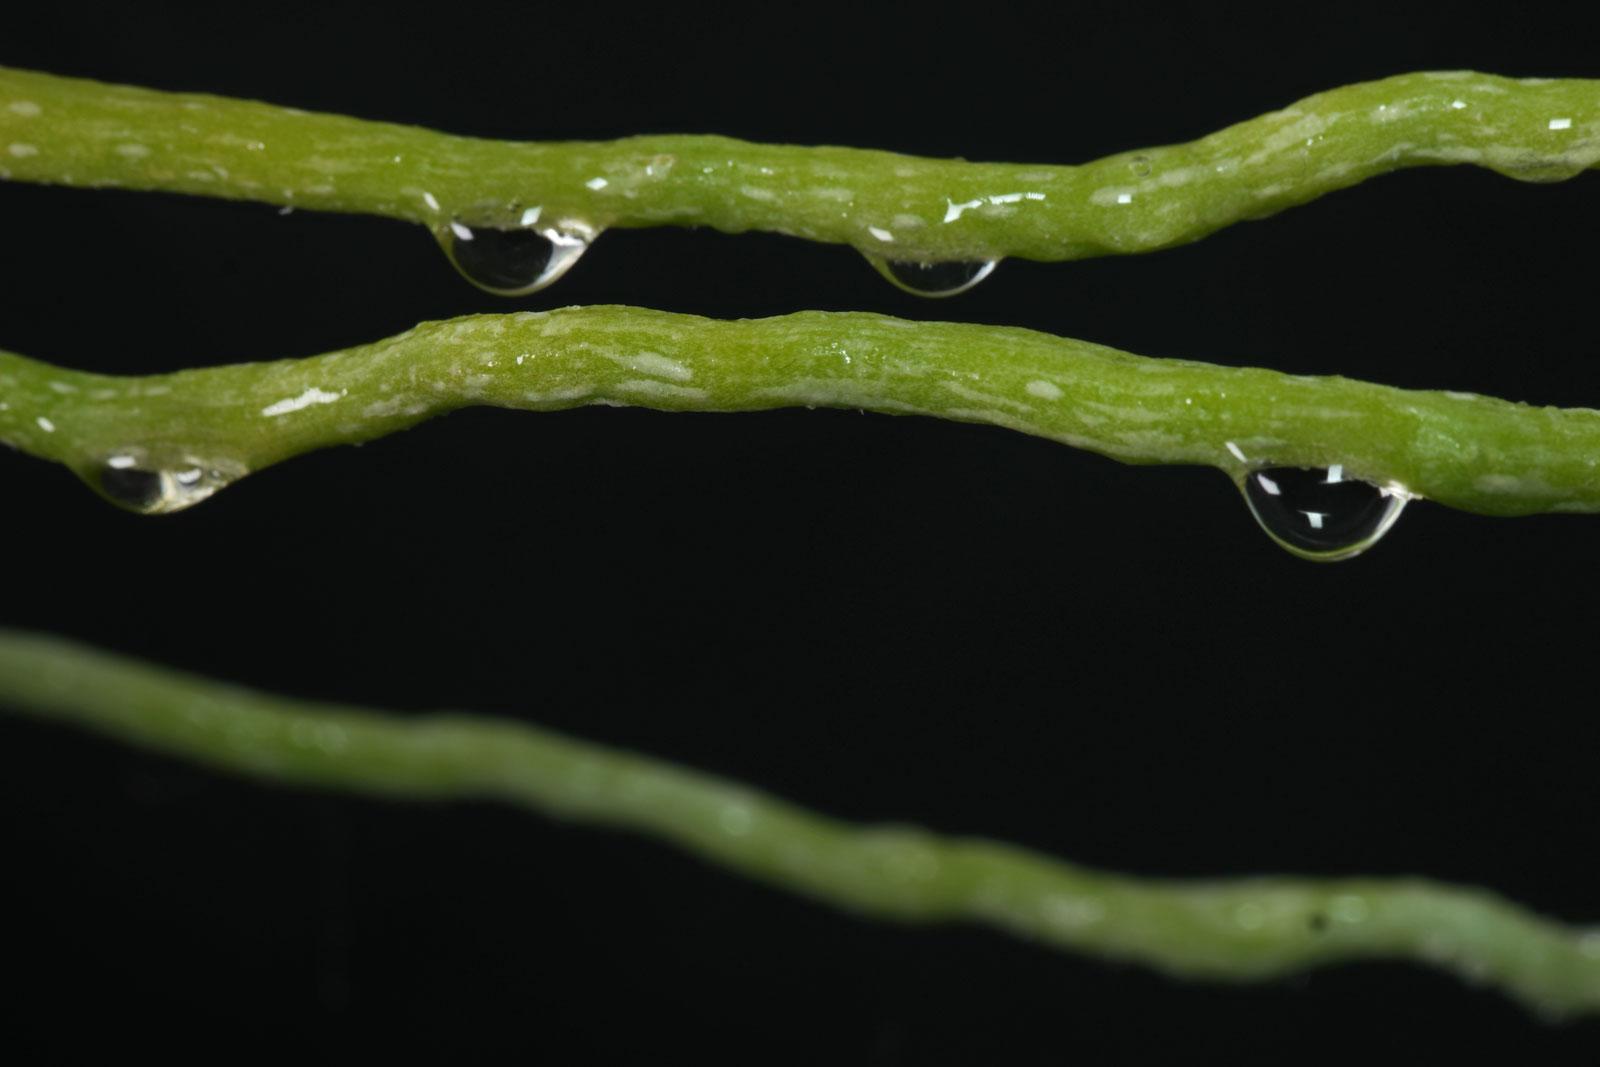 Phalaenopsis-Luftwurzeln